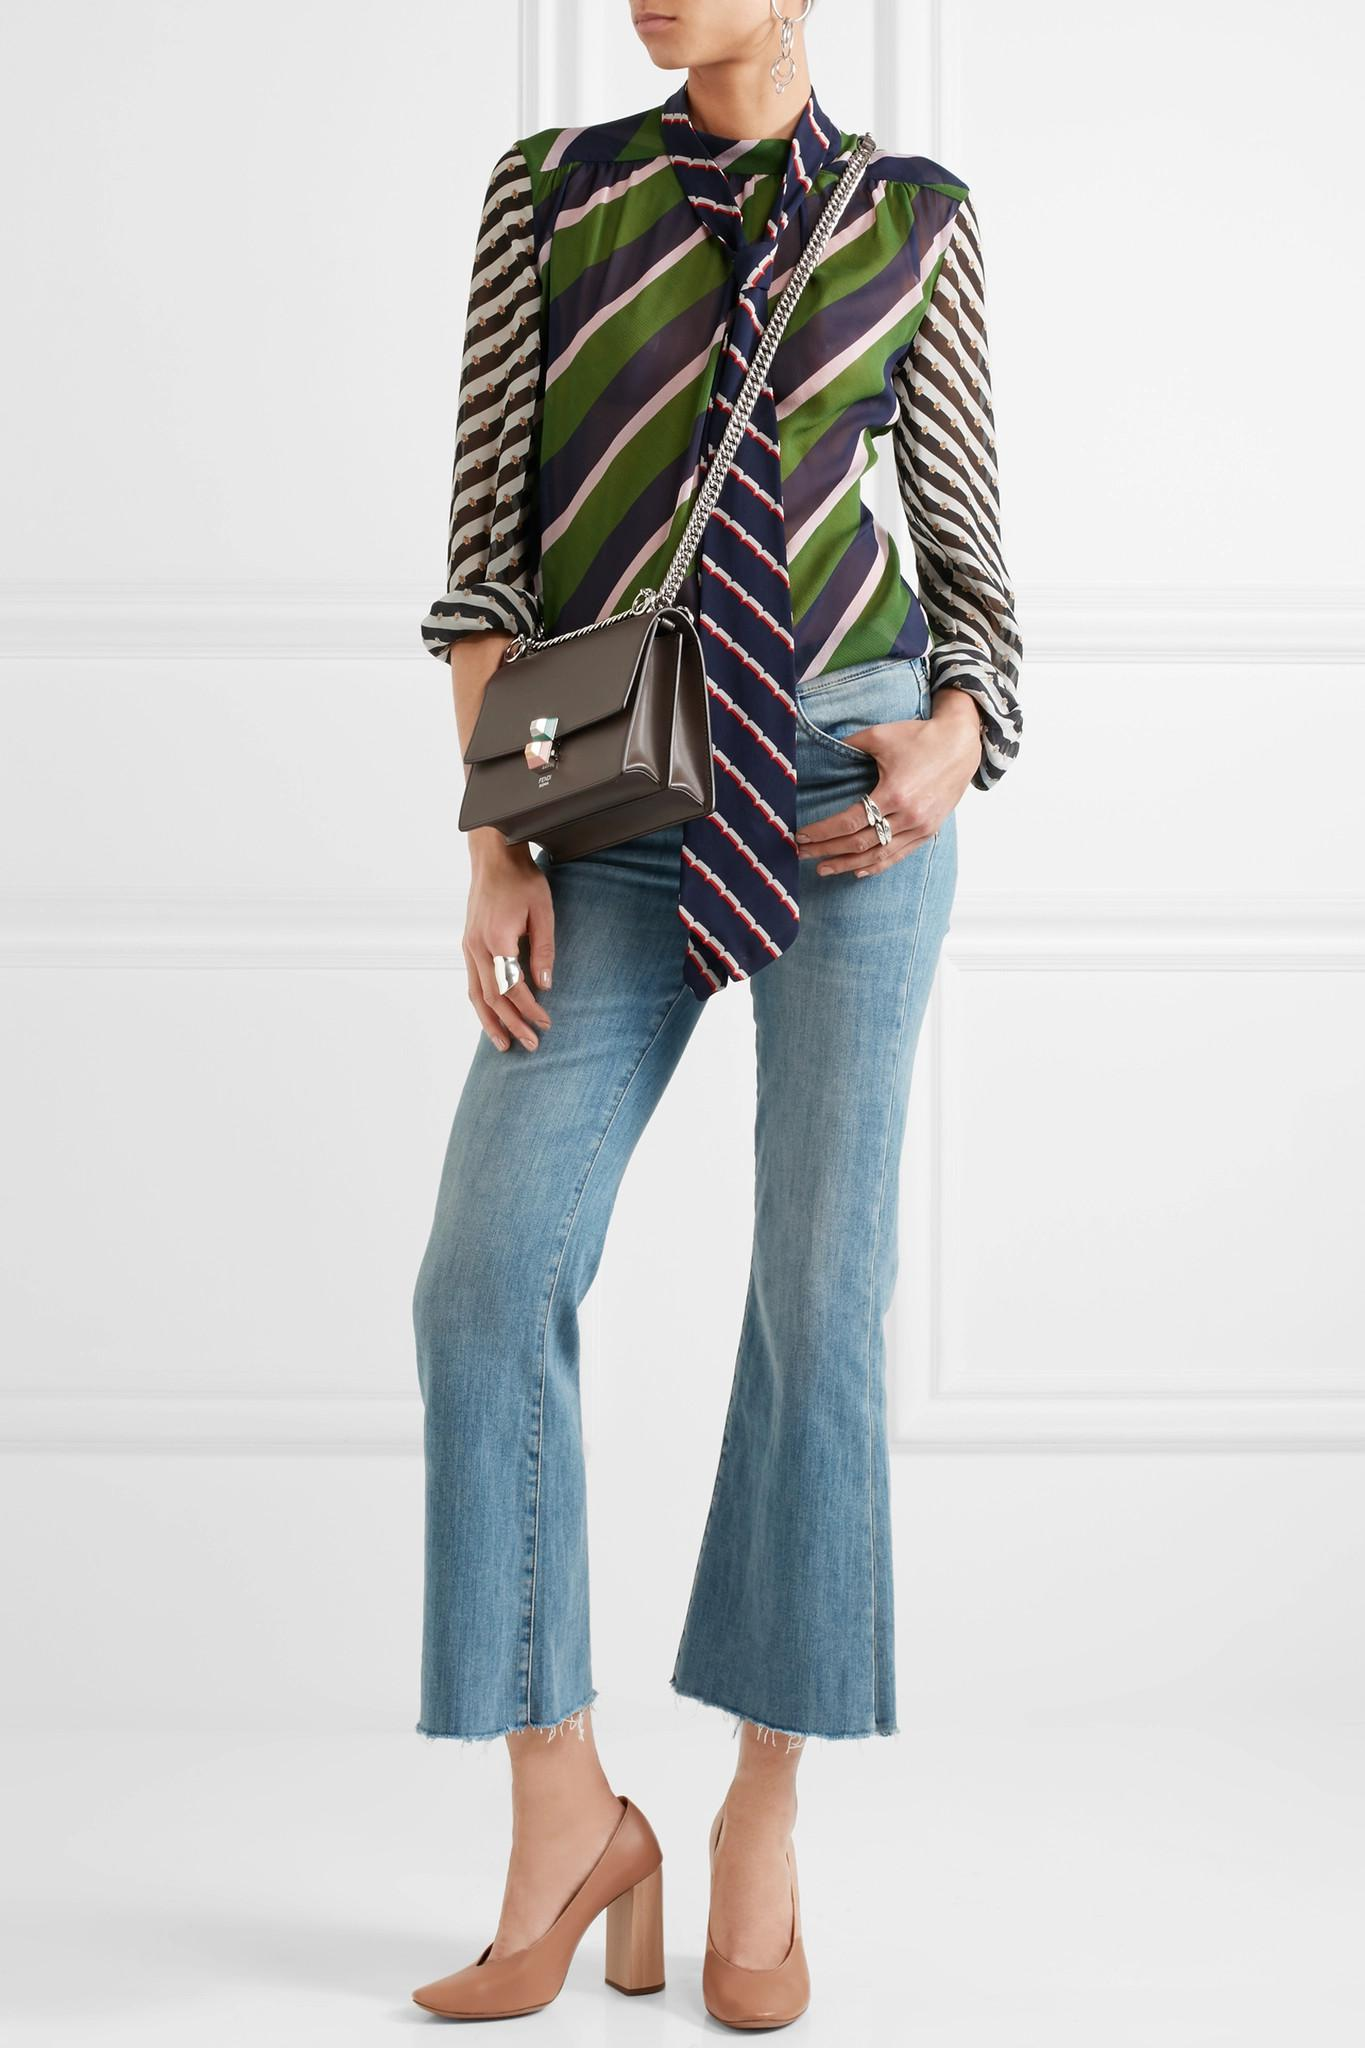 99c61be3398b Lyst - Fendi Kan I Leather Mini Shoulder Bag in Gray